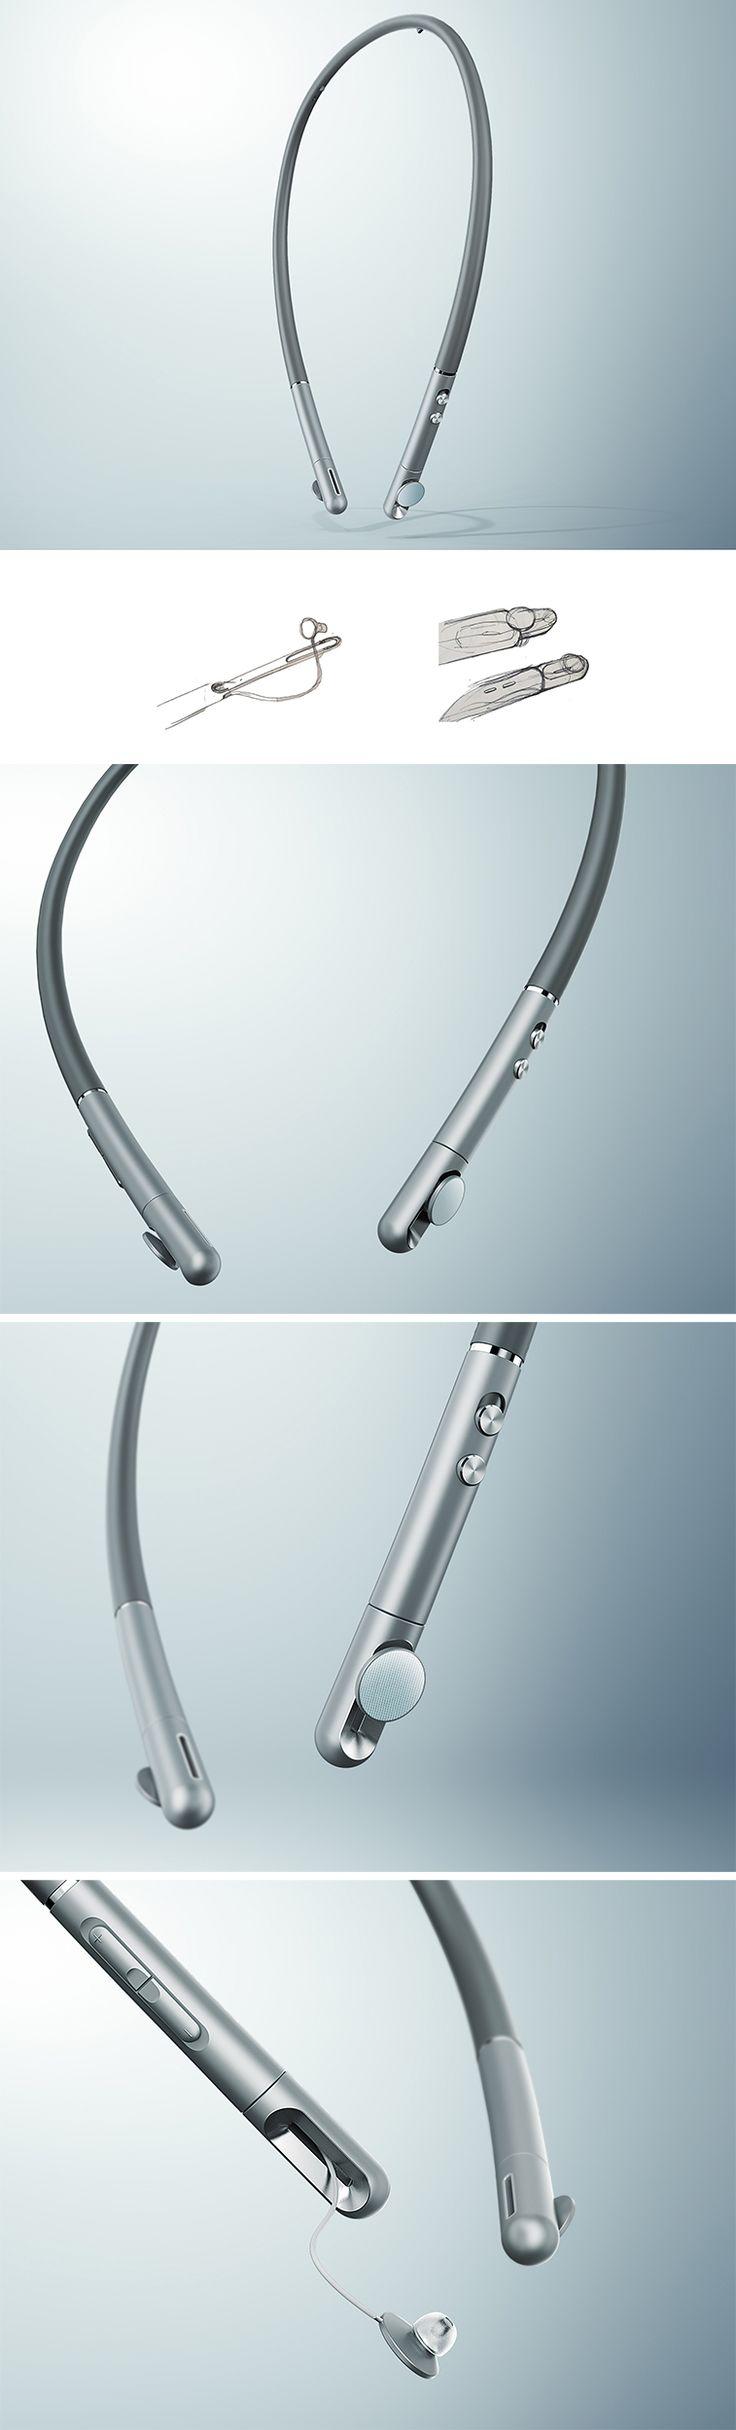 PDF HAUS_ Republic of Korea Design Academy / Product design / Industrial design / 工业设计 / 产品设计/ 空气净化器 / 산업디자인 / earphone/ lamy/라미 / 이어폰